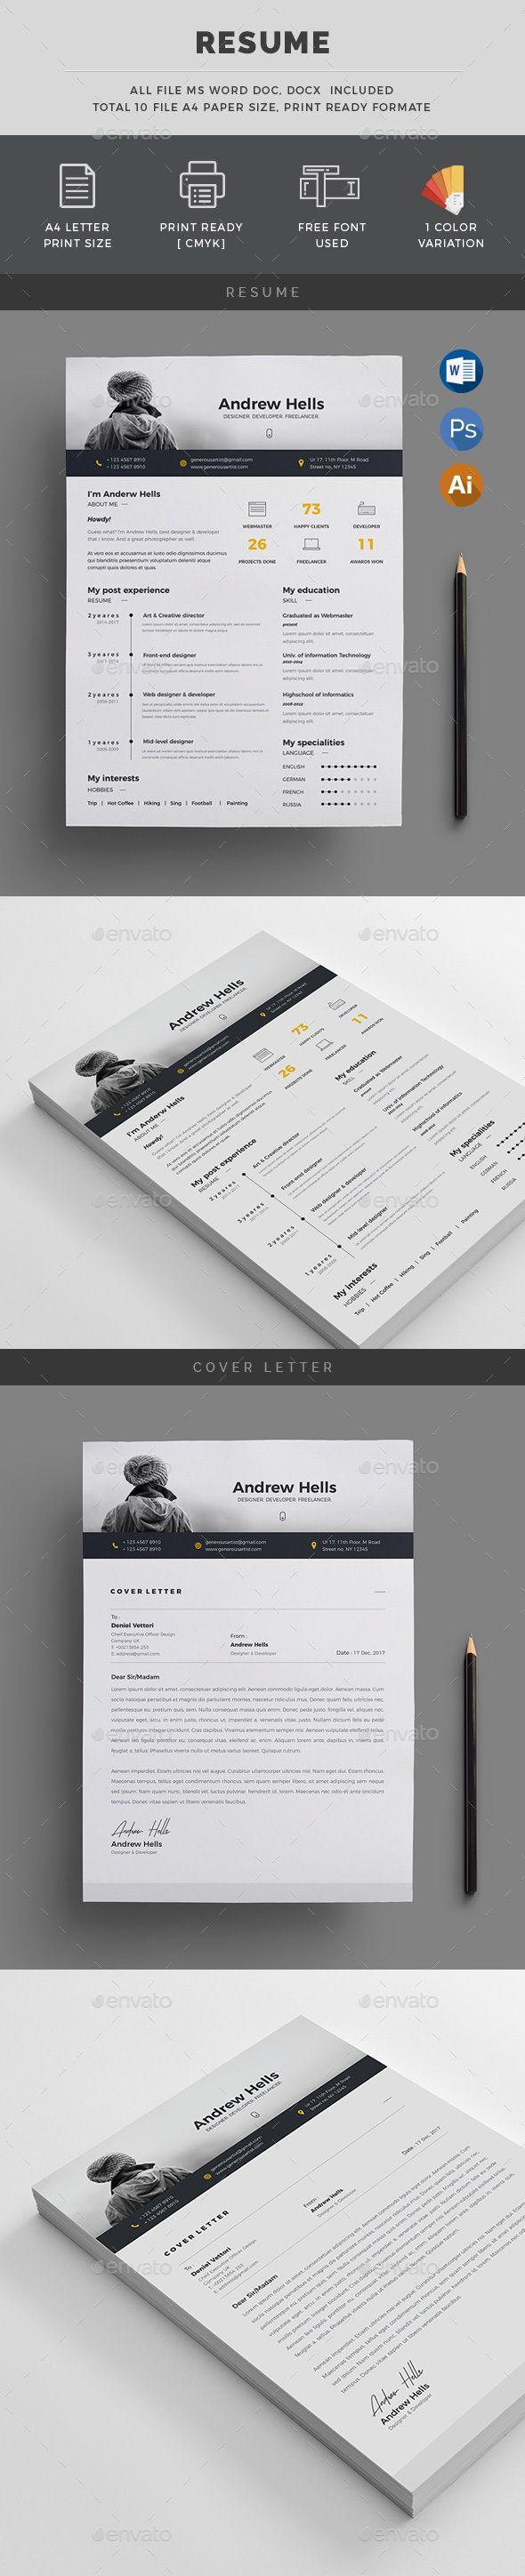 resumes photoshop psd designer letterhead  resume cv